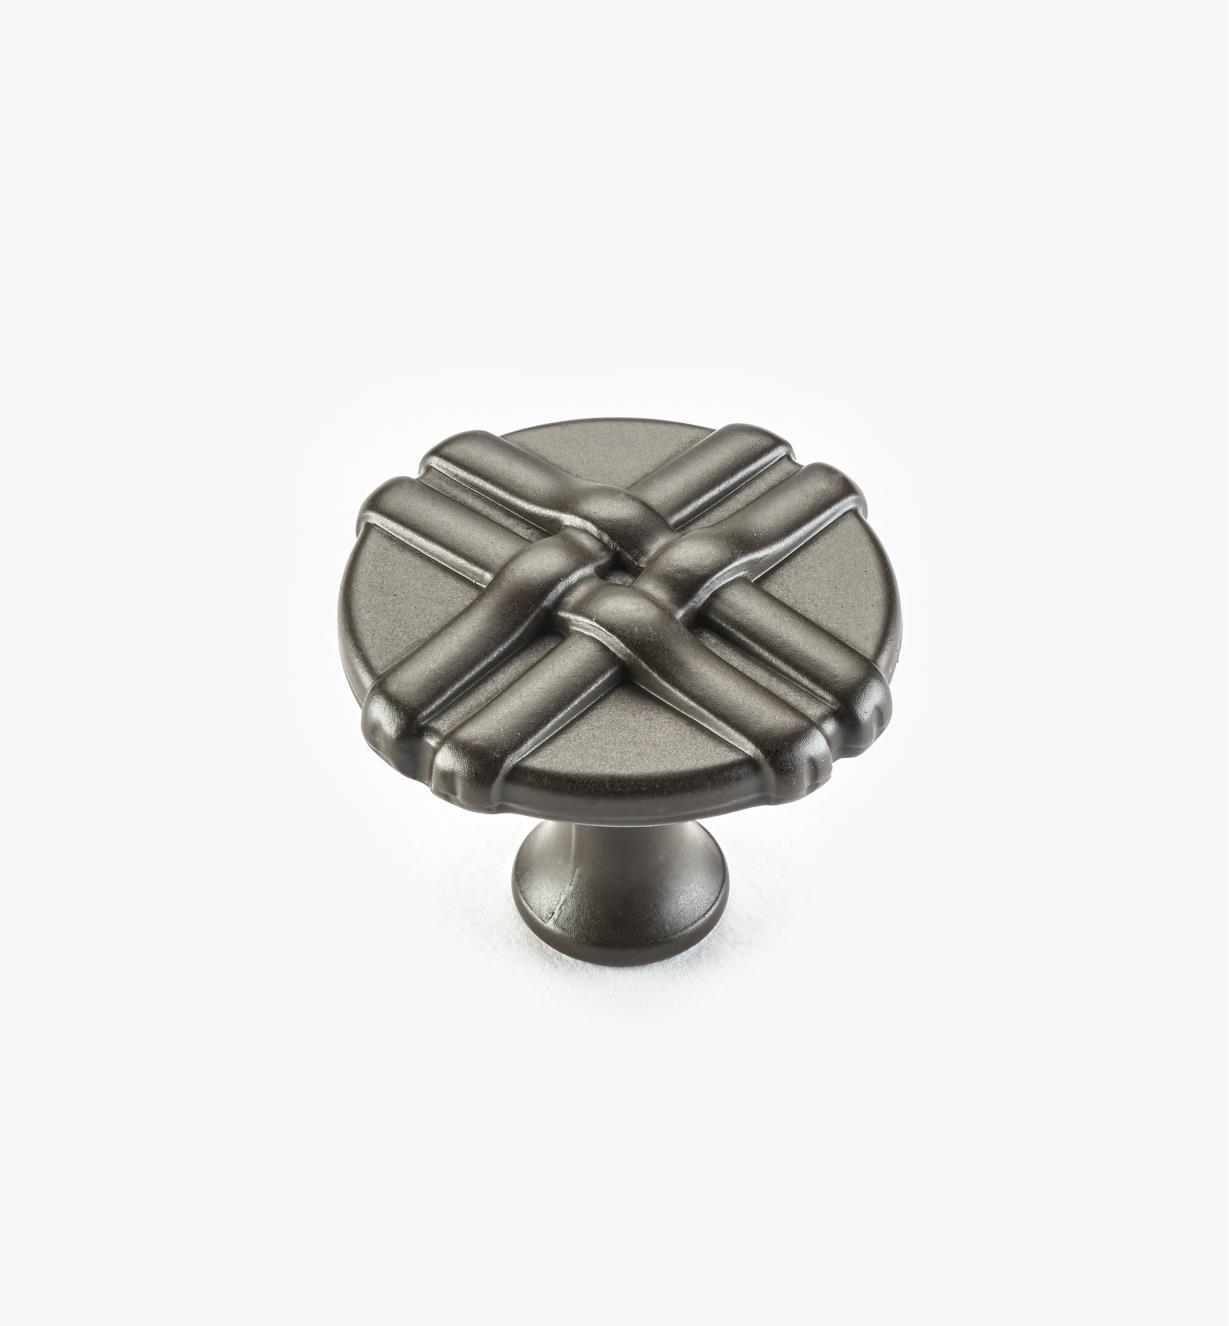 01W0636 - Bouton rubané de 34mm, fini bronze huilé